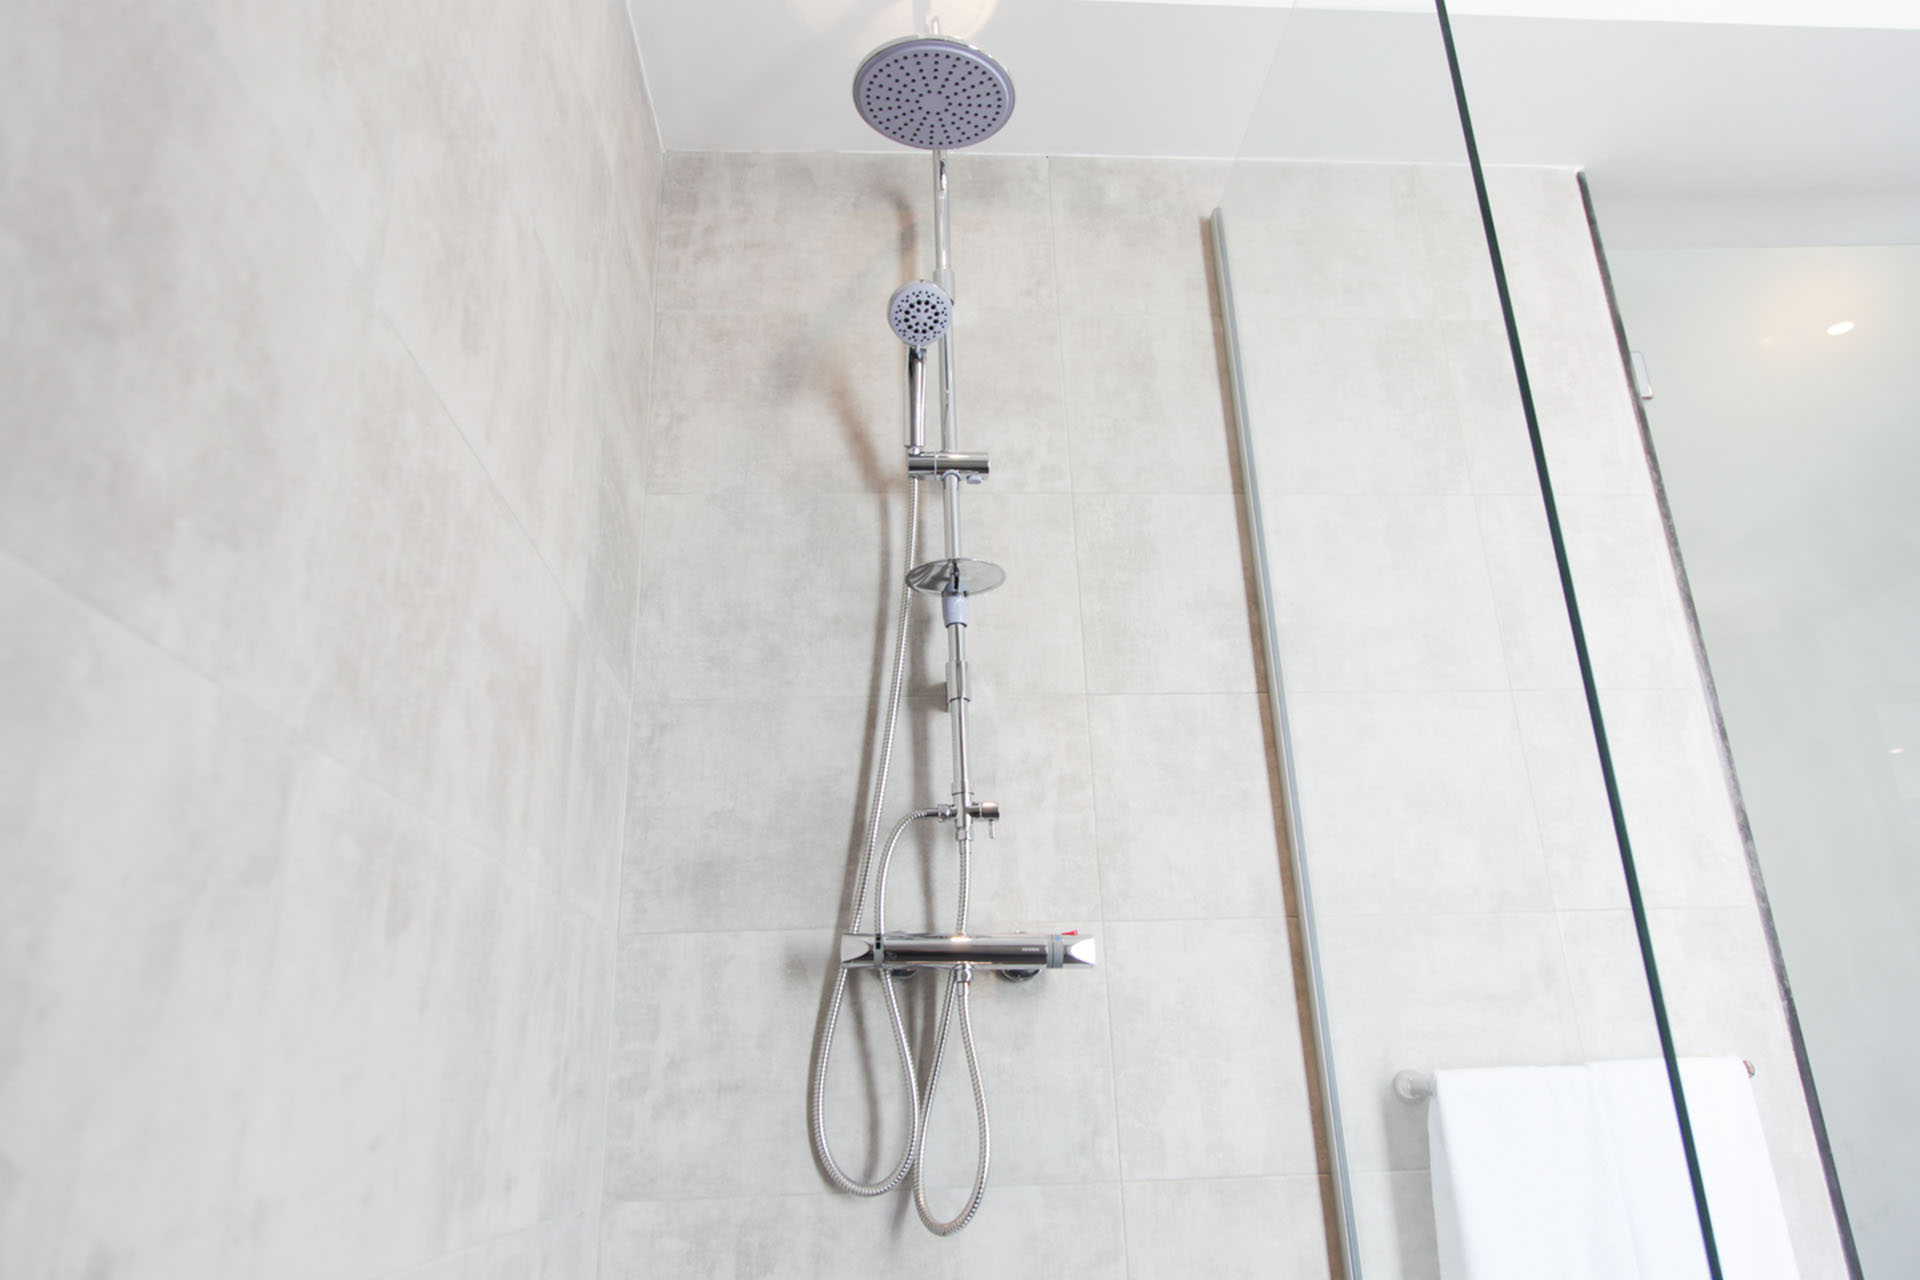 http://smartshotel.com/wp-content/uploads/2016/10/Bathroom.jpg